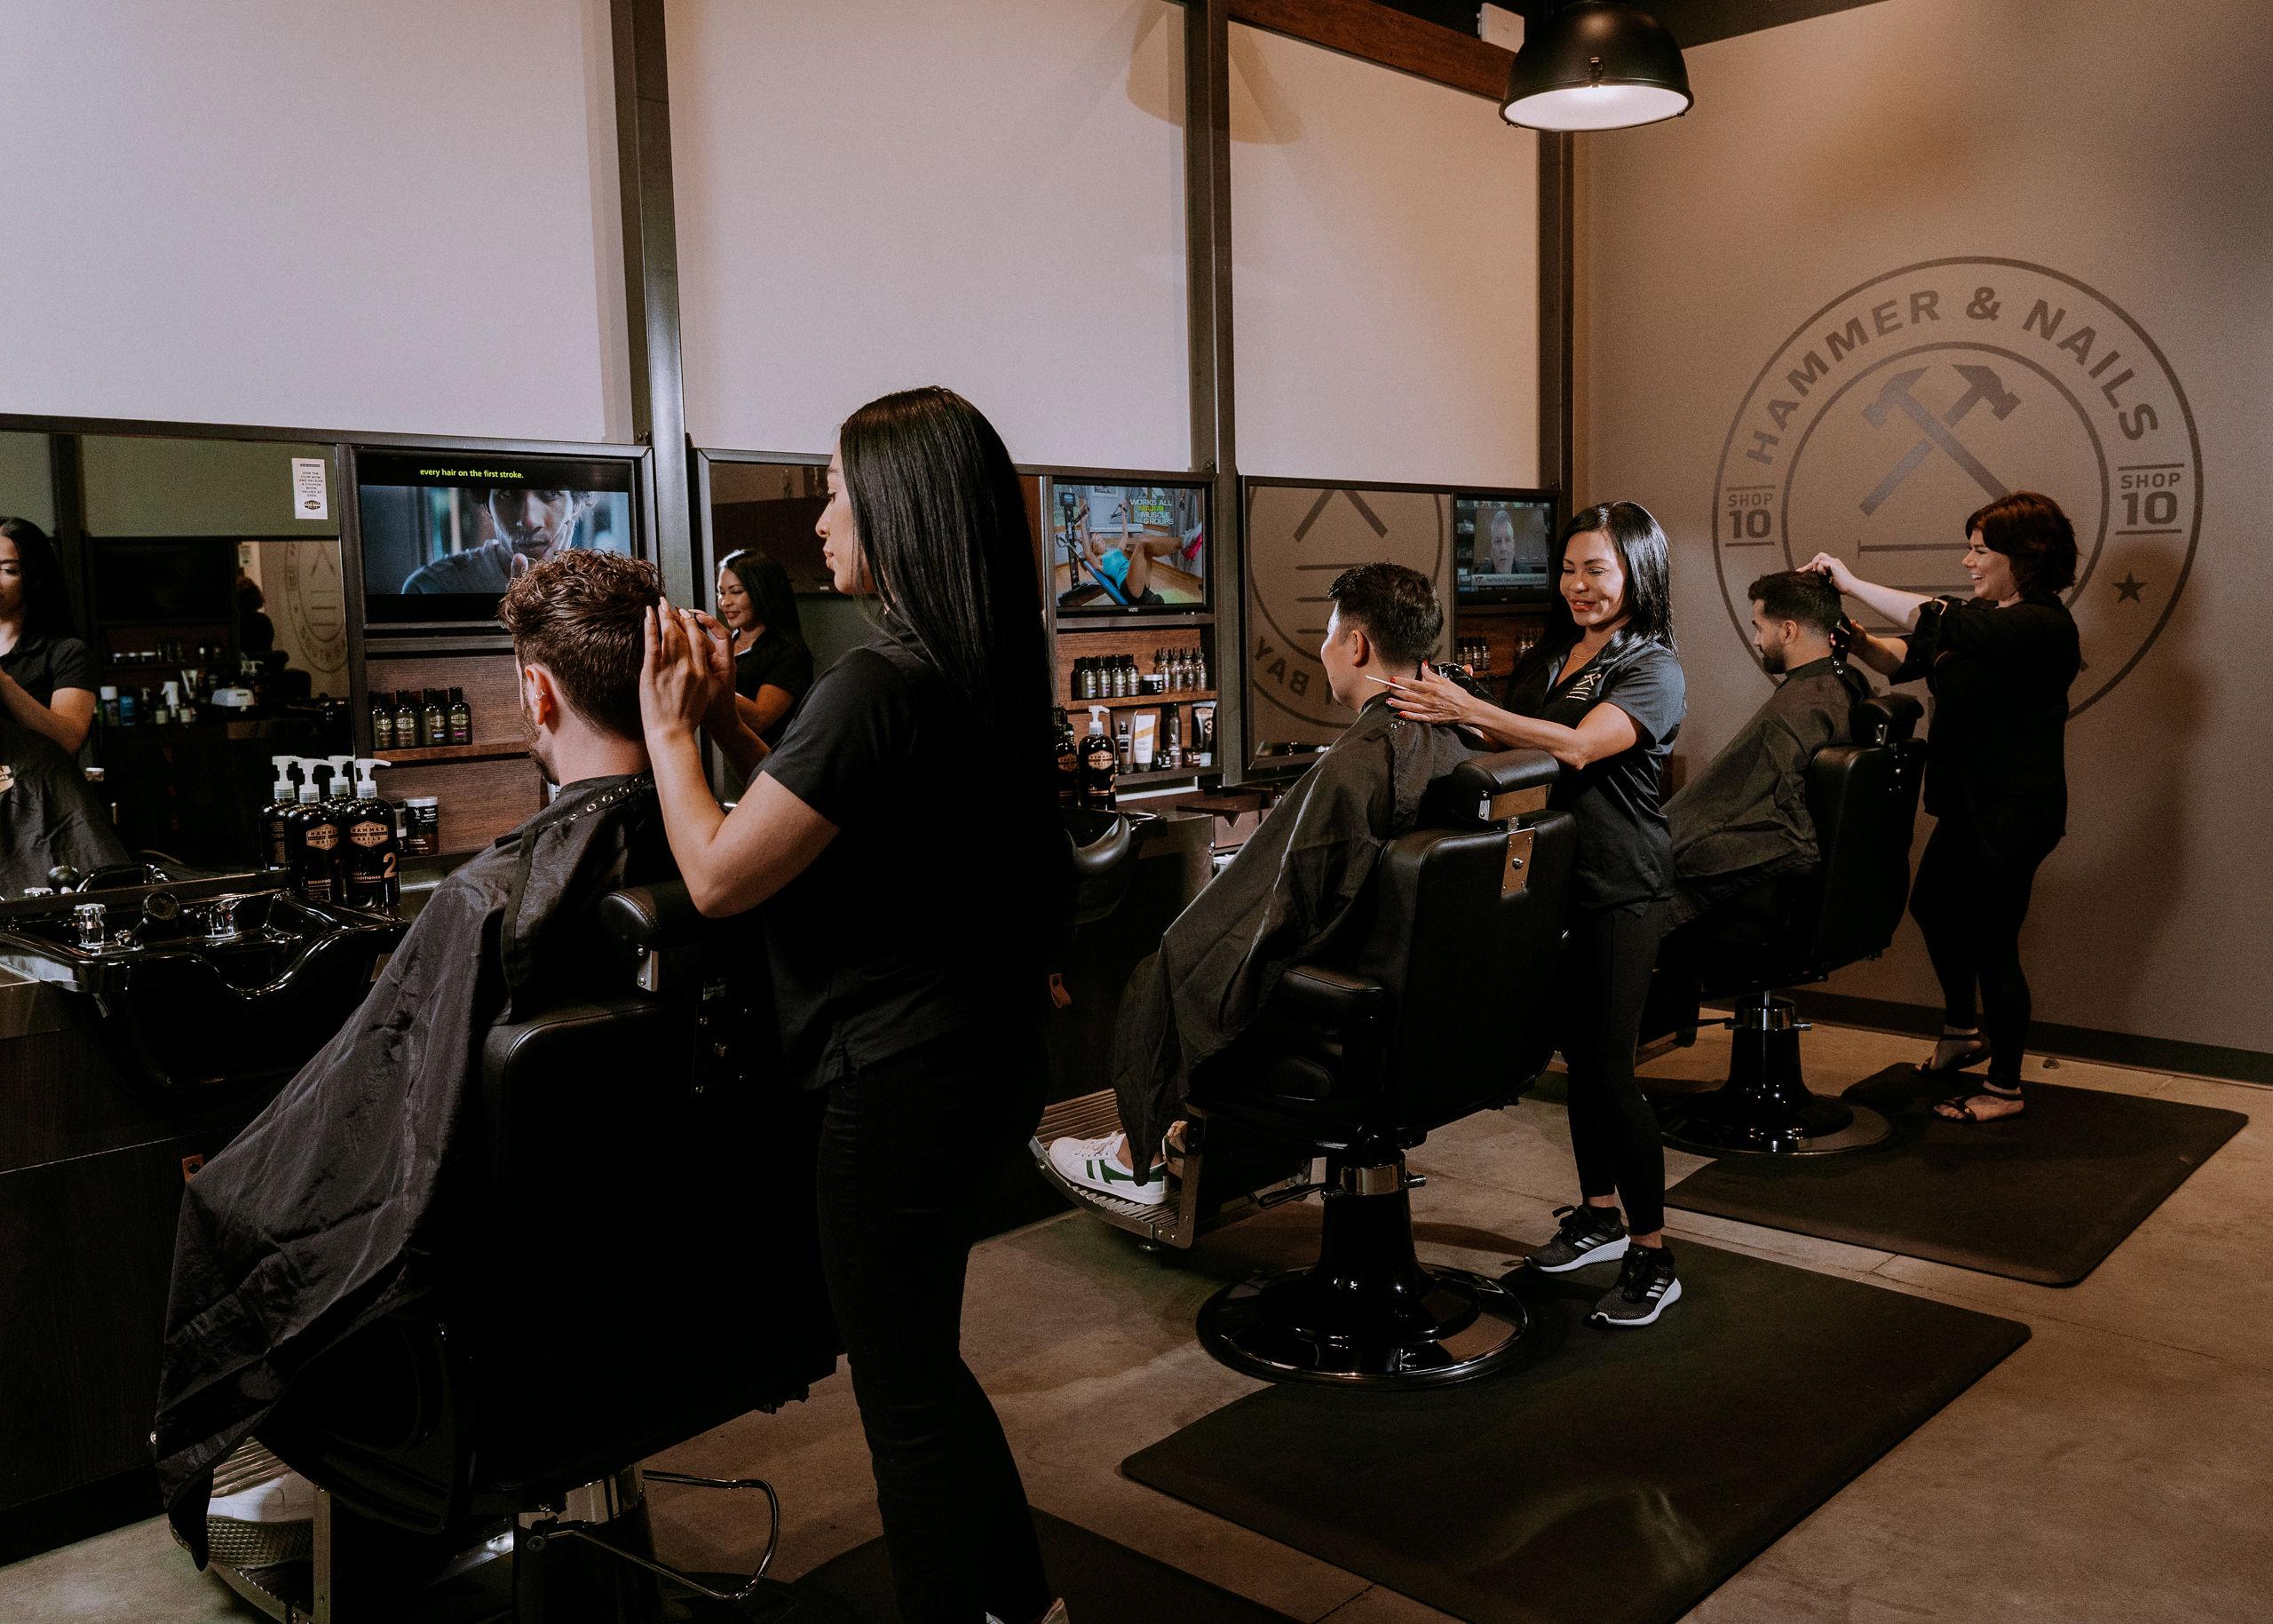 URGENTLY HIRING: Stylists/Barbers/Nail Techs! $250-$500 Sign-On BONUS!